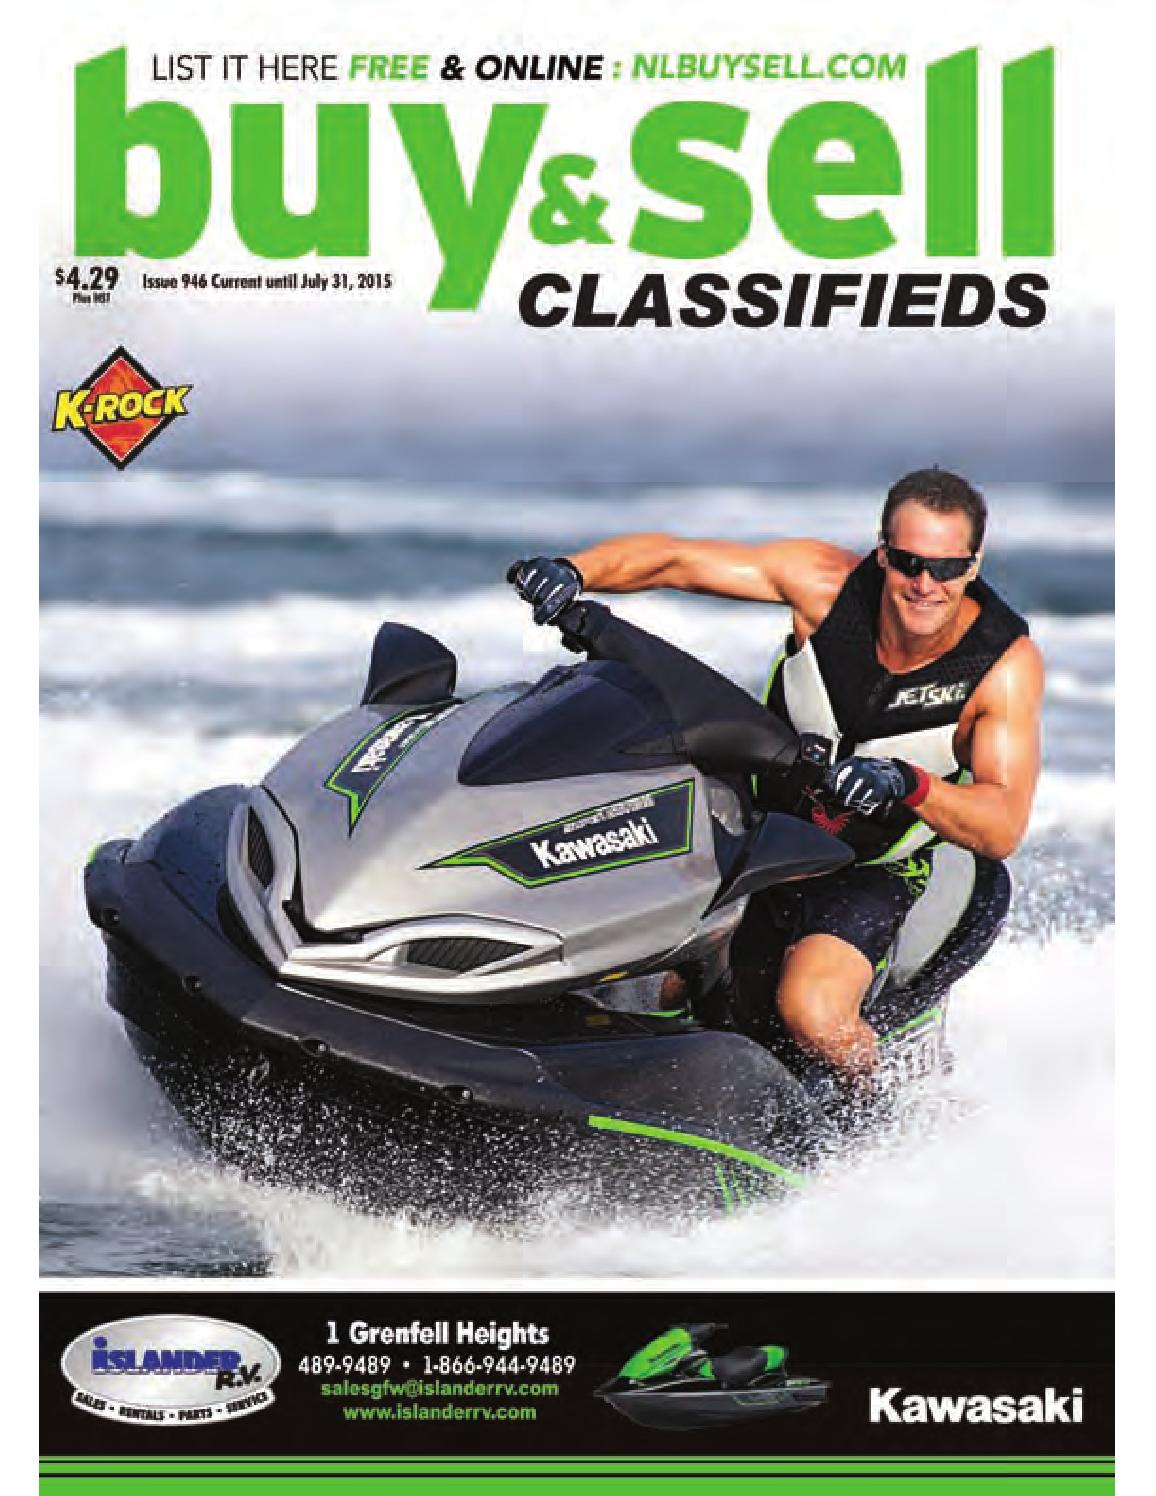 Yamaha Decals x4 GOLD Sticker Motorcycle Motocross Jetski Waverunner Bass Boat